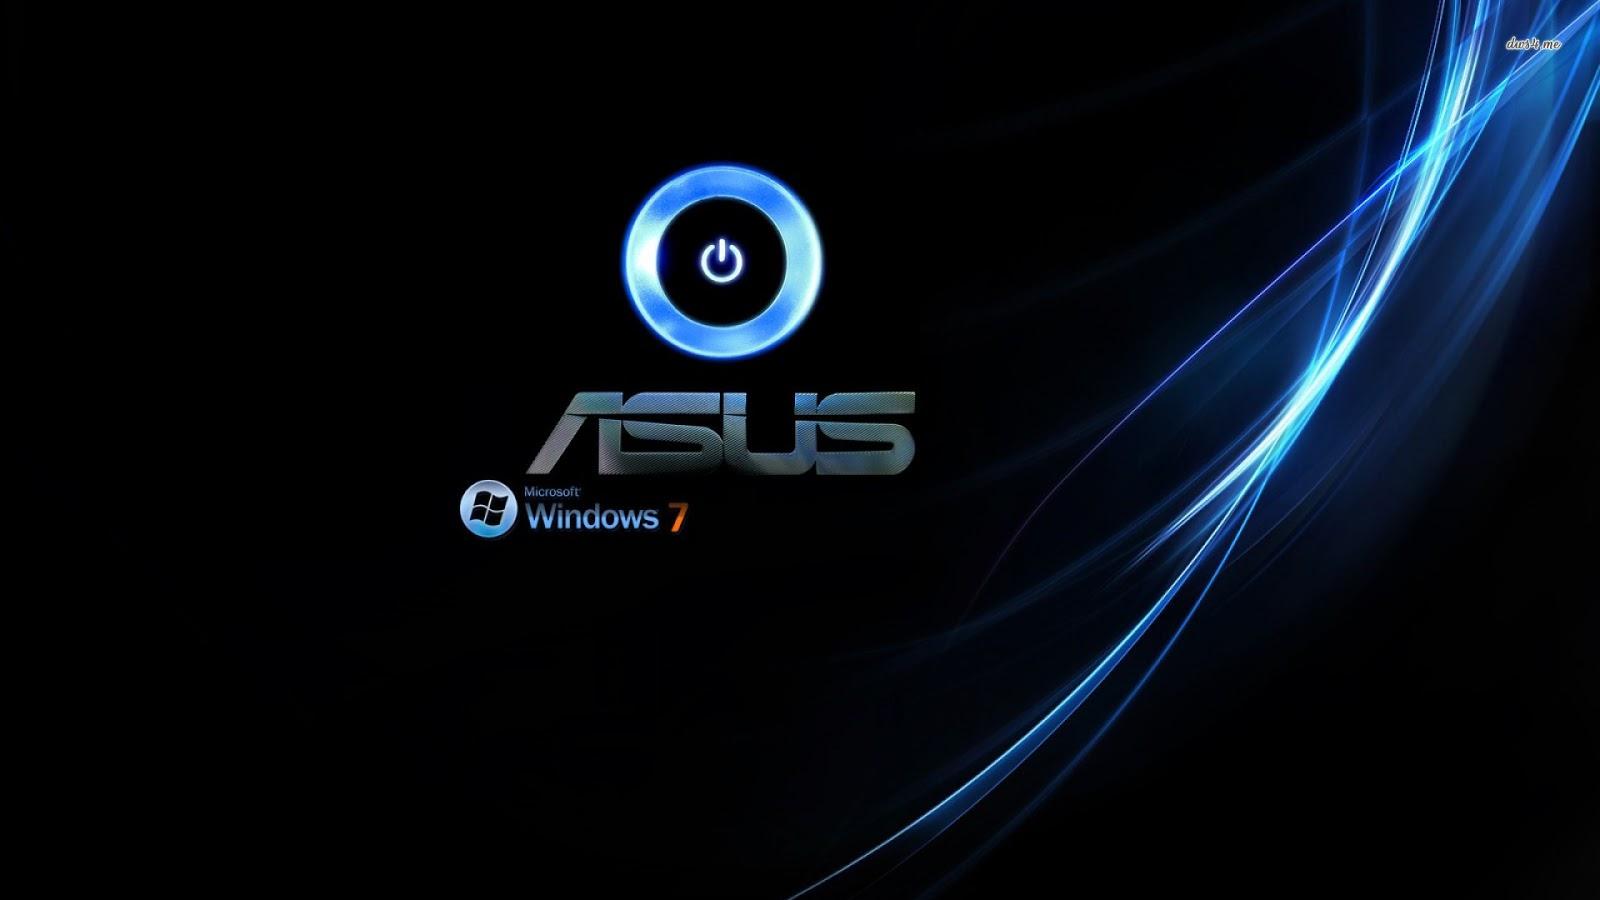 Asus Windows 7 Computer Logo Dark Black HD Wallpaper Desktop PC Background A14